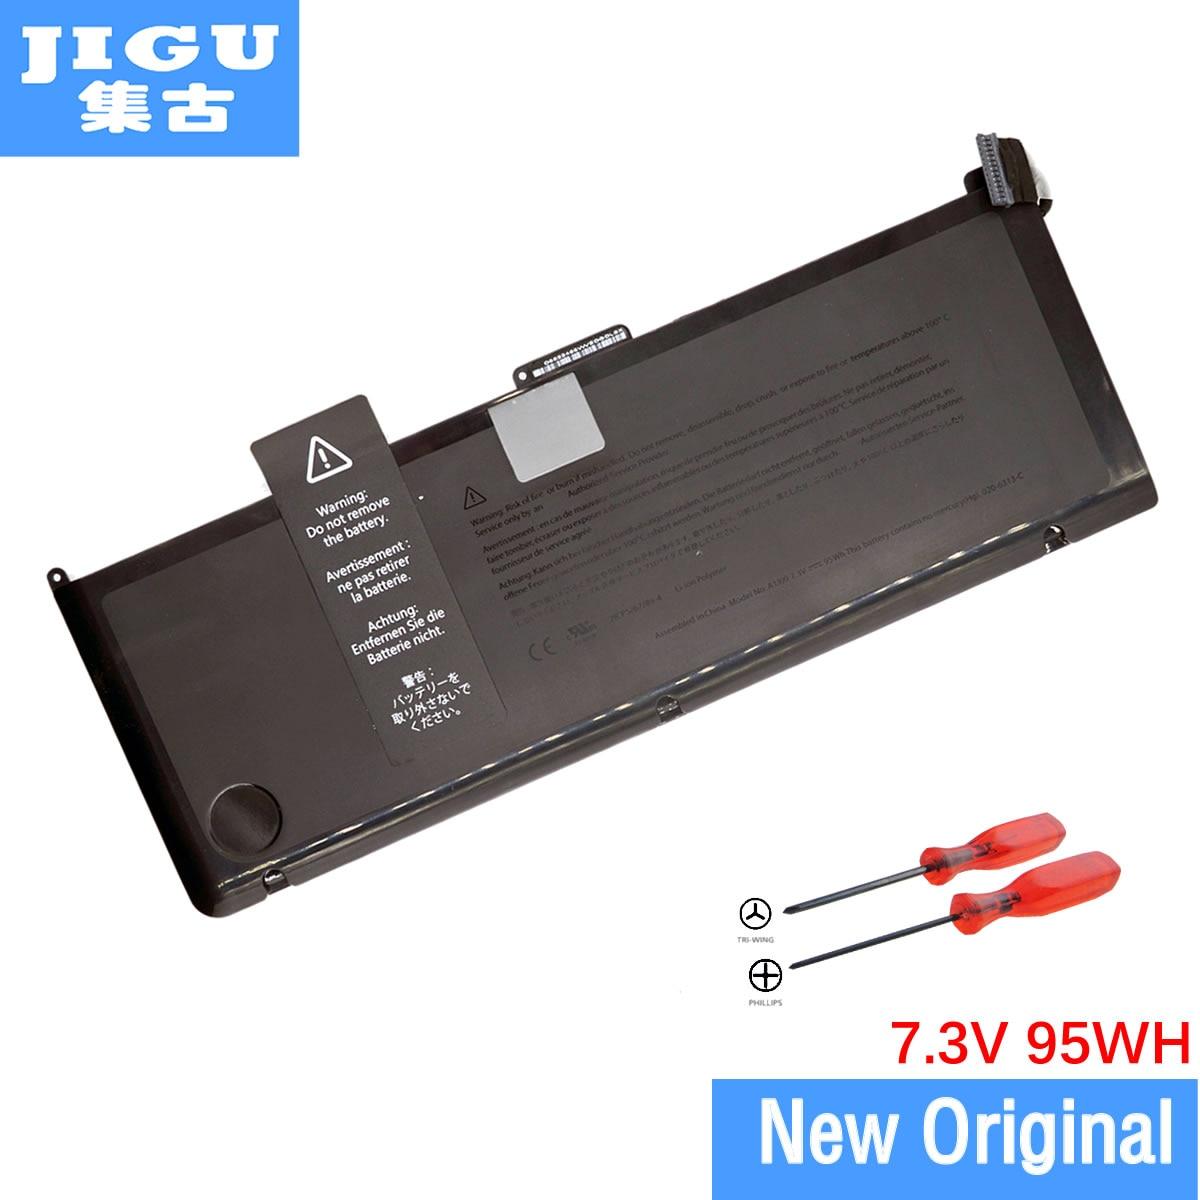 JIGU A1309 Original Laptop Battery For APPLE for MacBook Pro 17 A1297  [2009 Production] MC226*/A MC226CH/A 95WH 43w4342 44e8763 battery for mr10i mr10is original 95